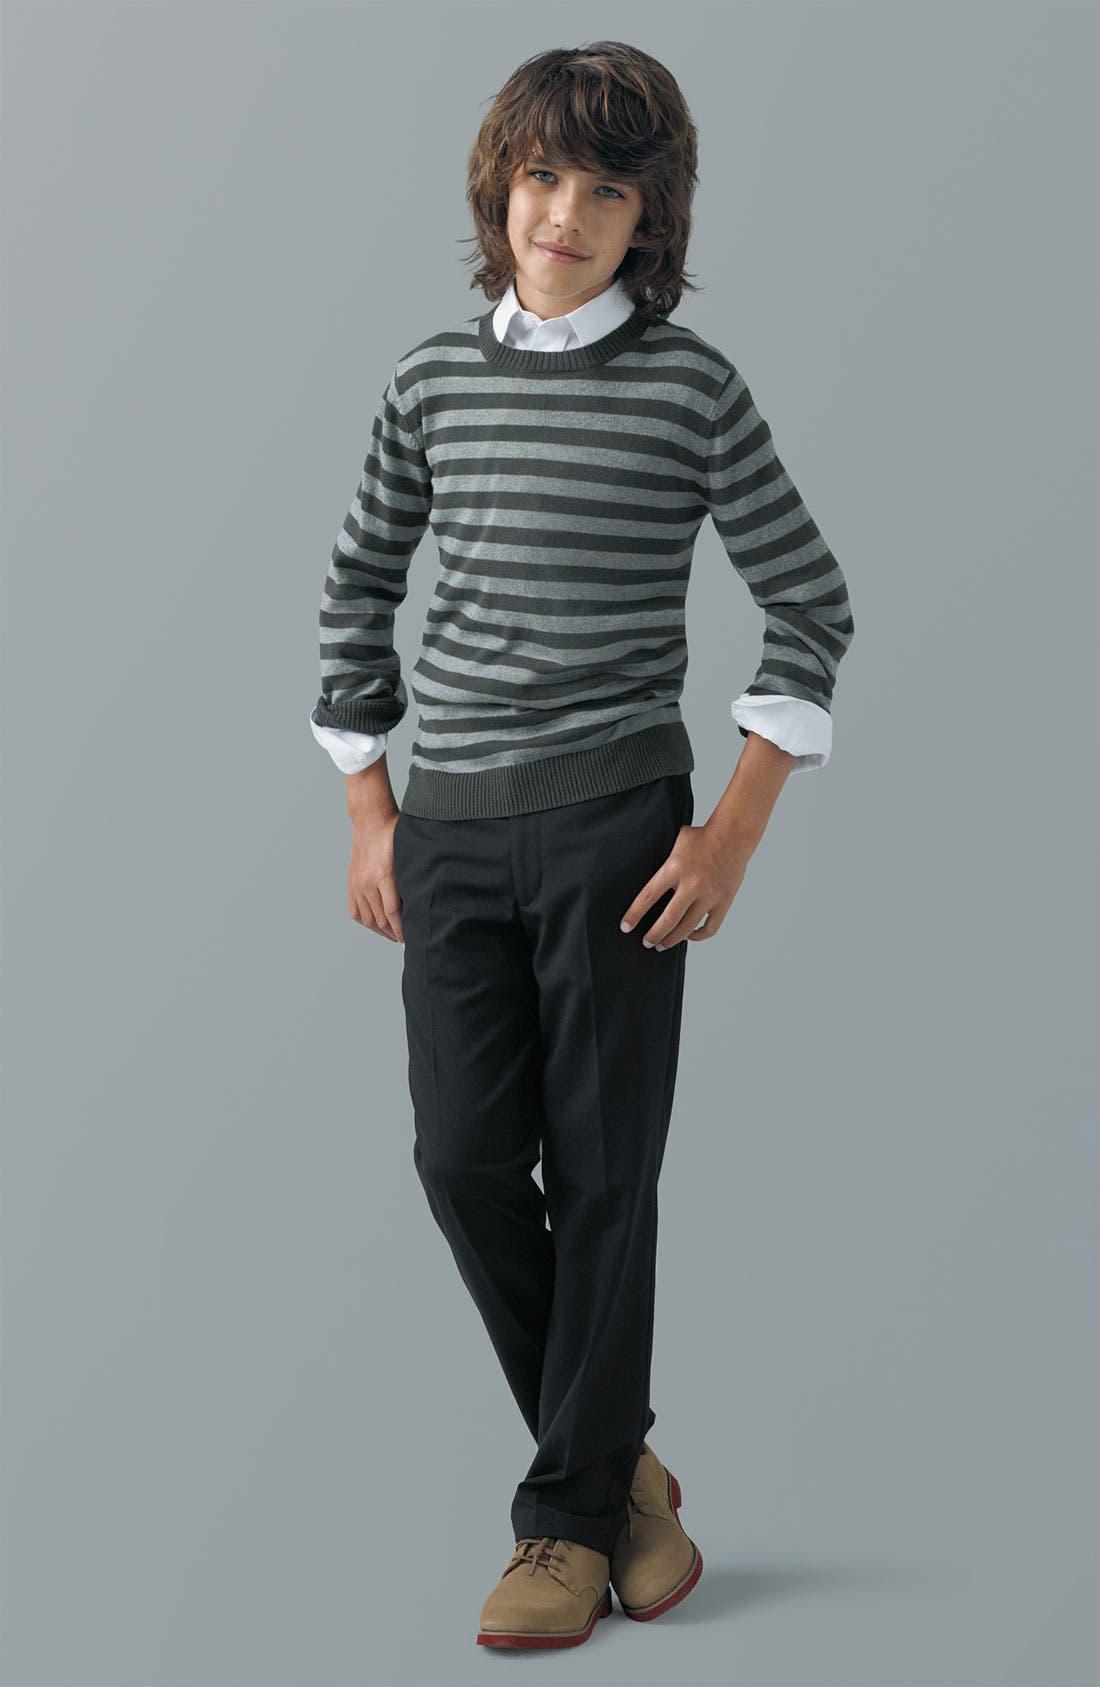 Main Image - Tucker + Tate Sweater, Nordstrom Shirt & Joseph Abboud Pants (Little Boys & Big Boys)